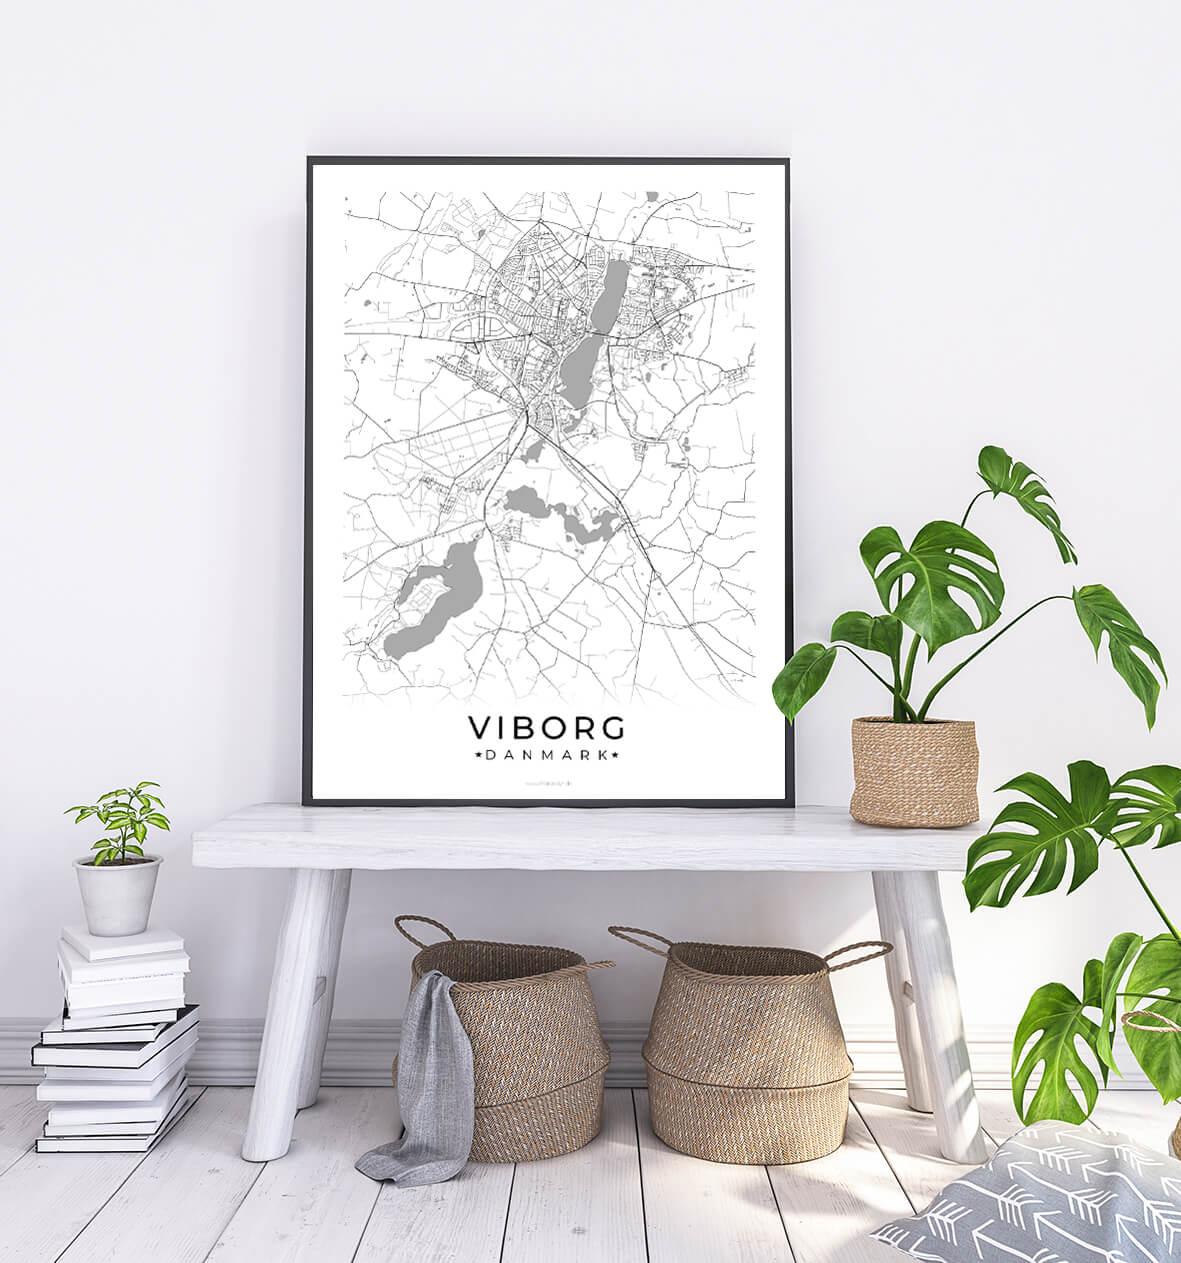 Viborg-hvid-byplakat-1